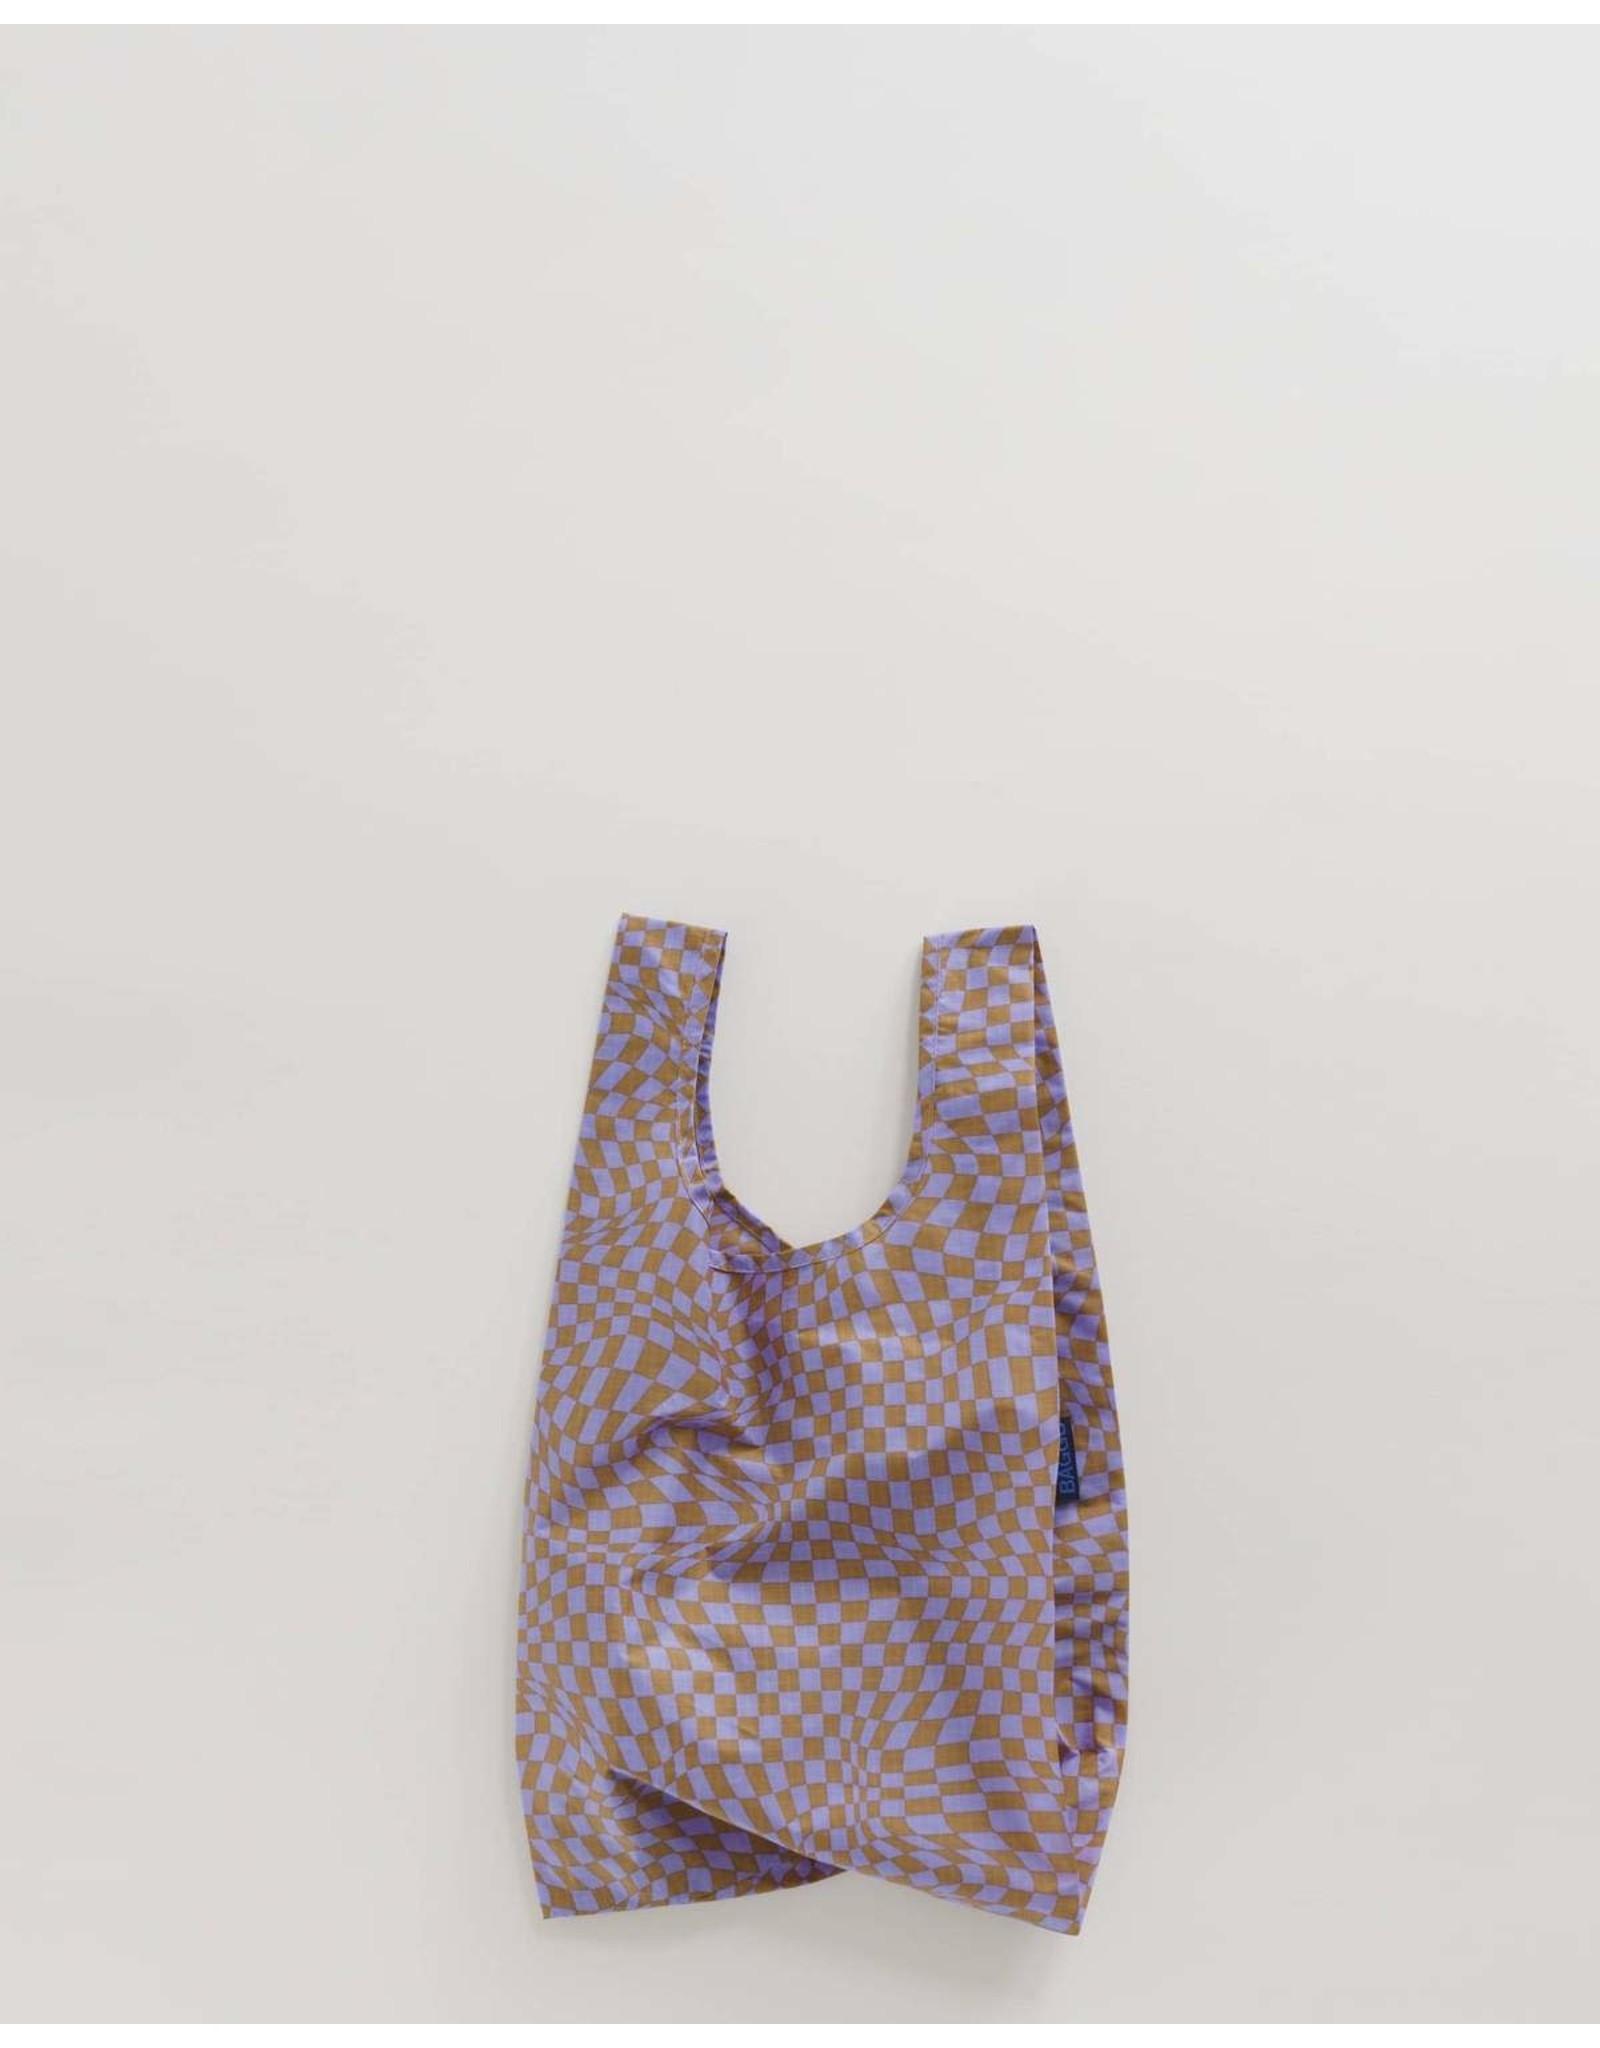 Baggu Baggu Lavender Trippy Checker Baby Reusable Bag